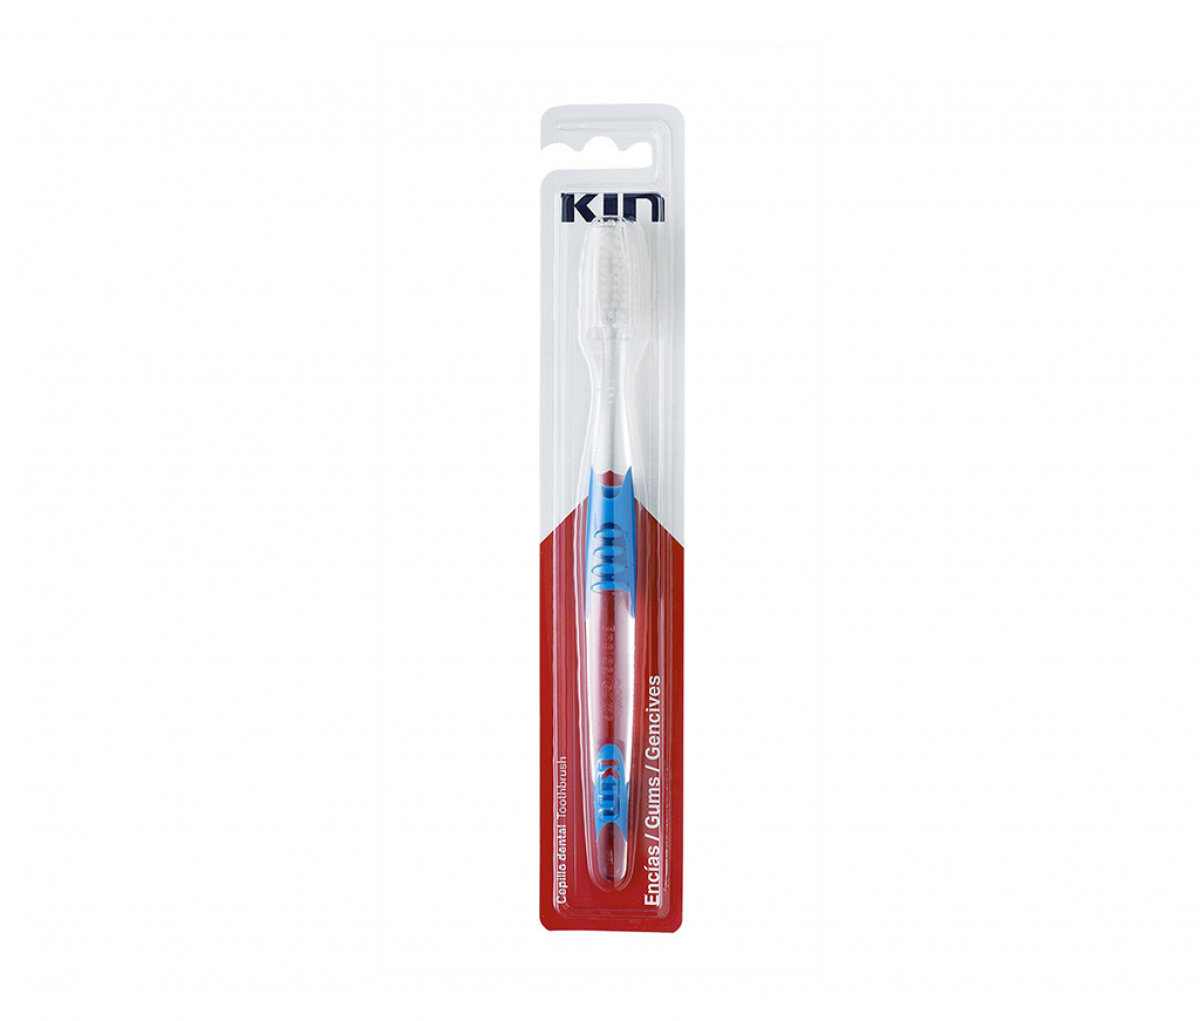 KIN Sensitive Gum Toothbrush